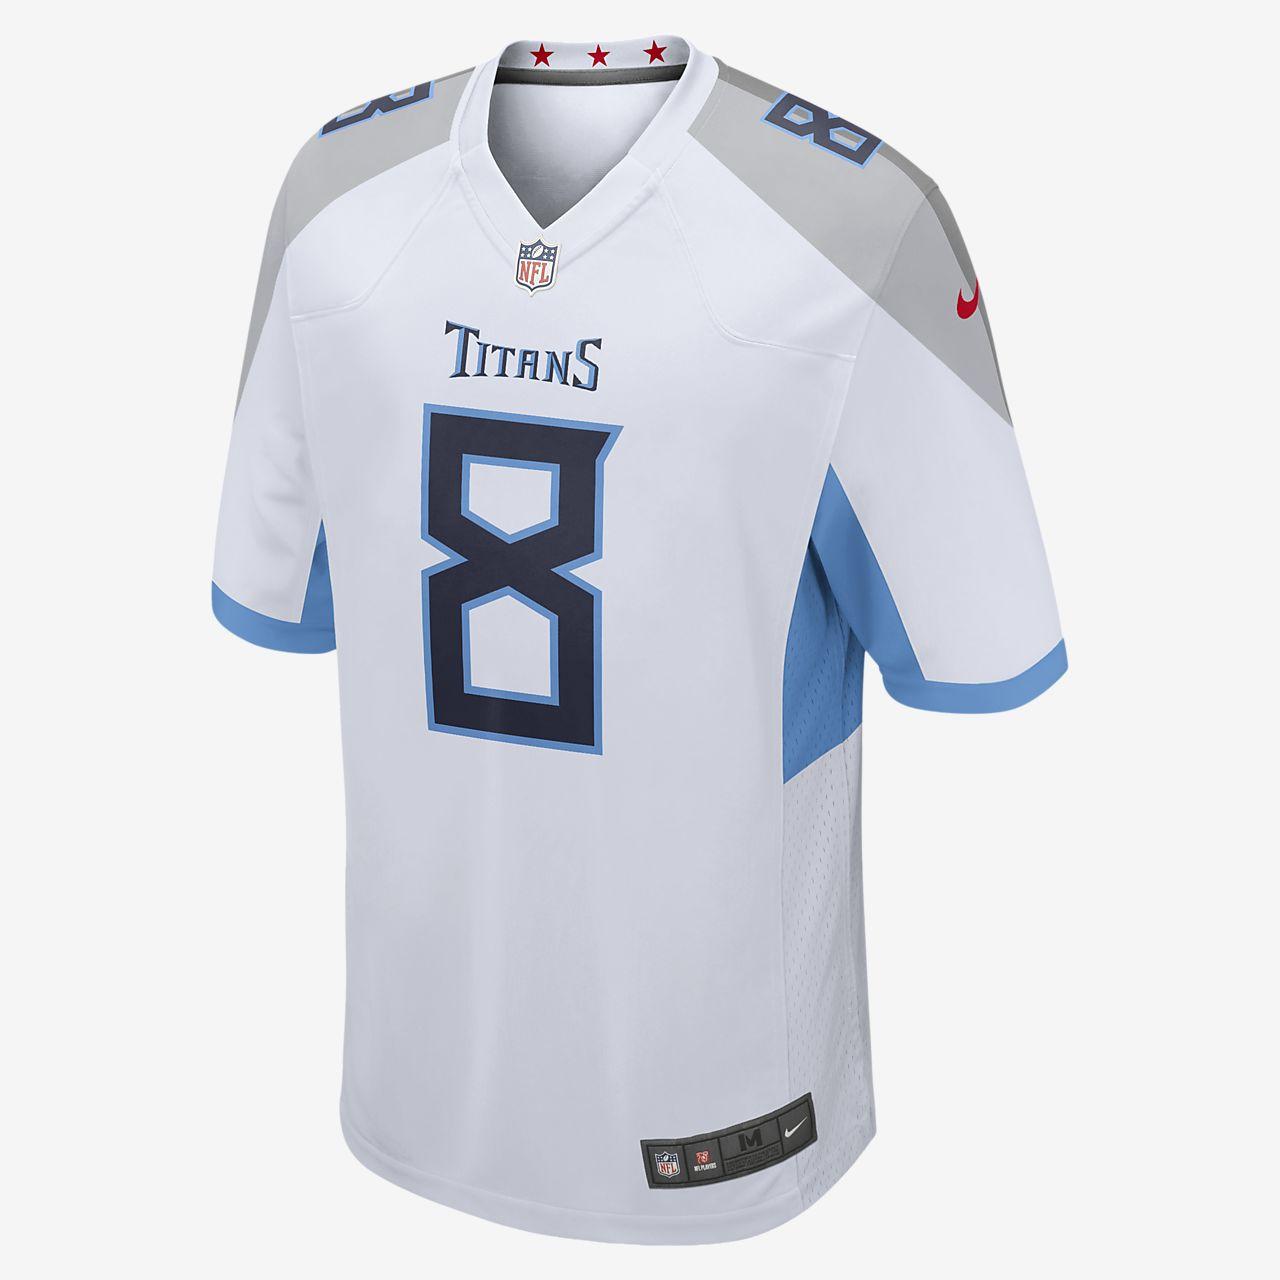 cb098612dd6 ... NFL Tennessee Titans (Marcus Mariota) Men's Football Away Game Jersey